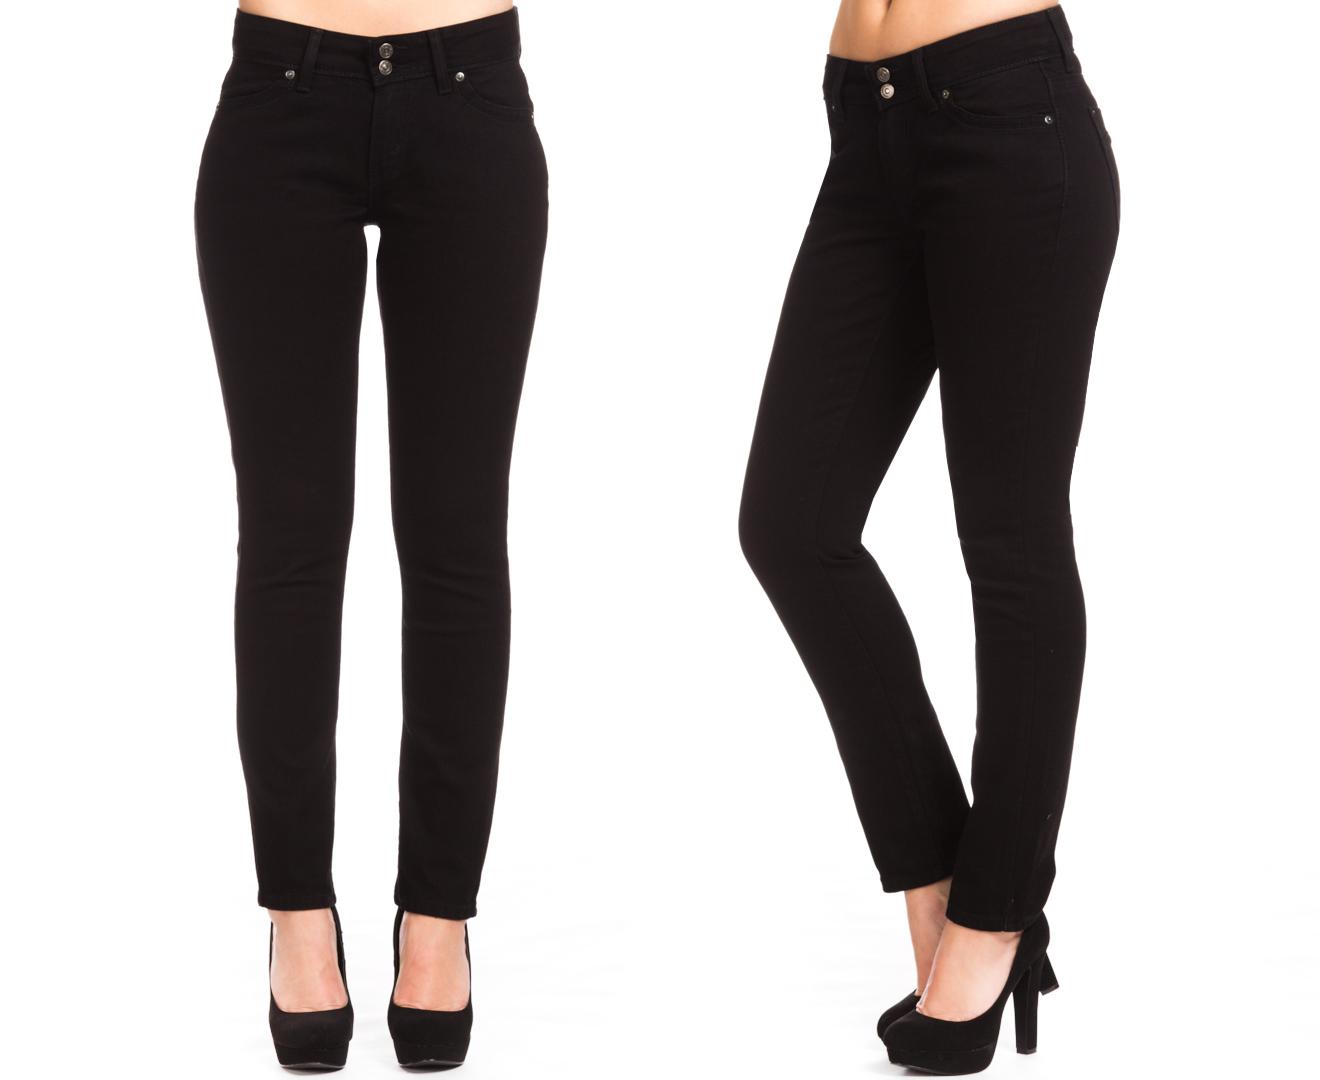 - Catch.com.au Levis Women's 529 Curvy Skinny Jeans - Black Ink